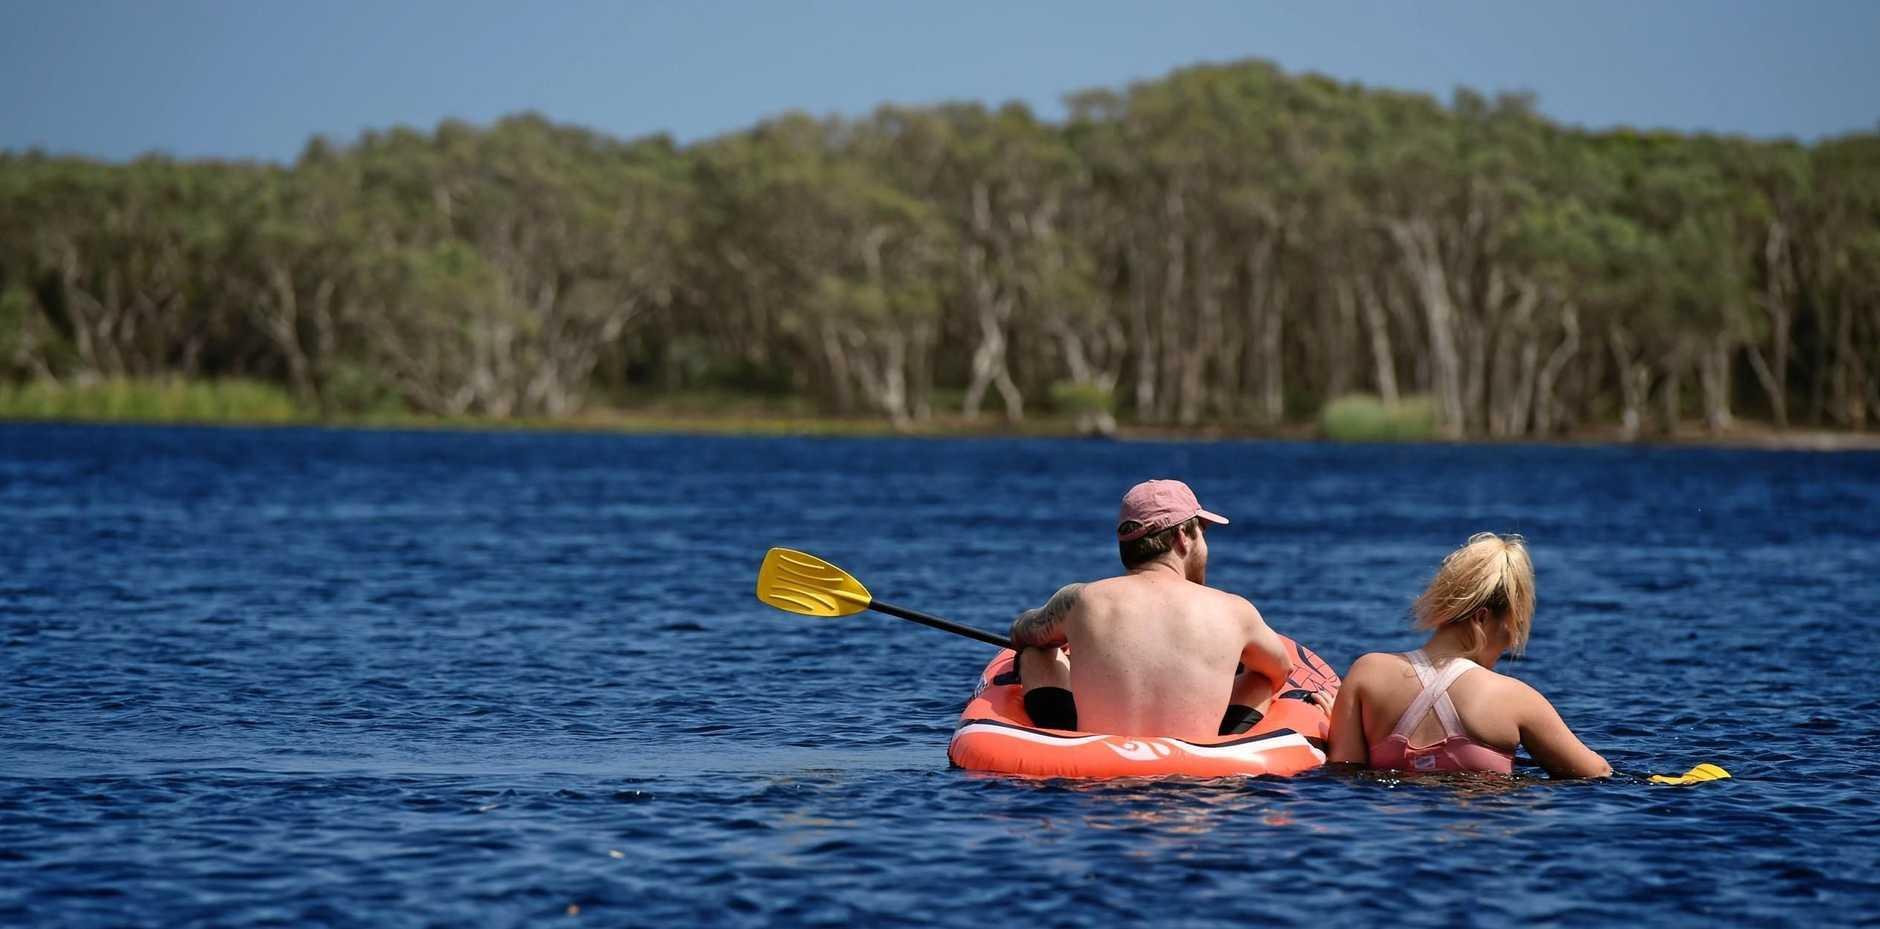 Chelsea Jones and Luke Mackay, of Lismore, at Lake Ainsworth in Lennox Head.